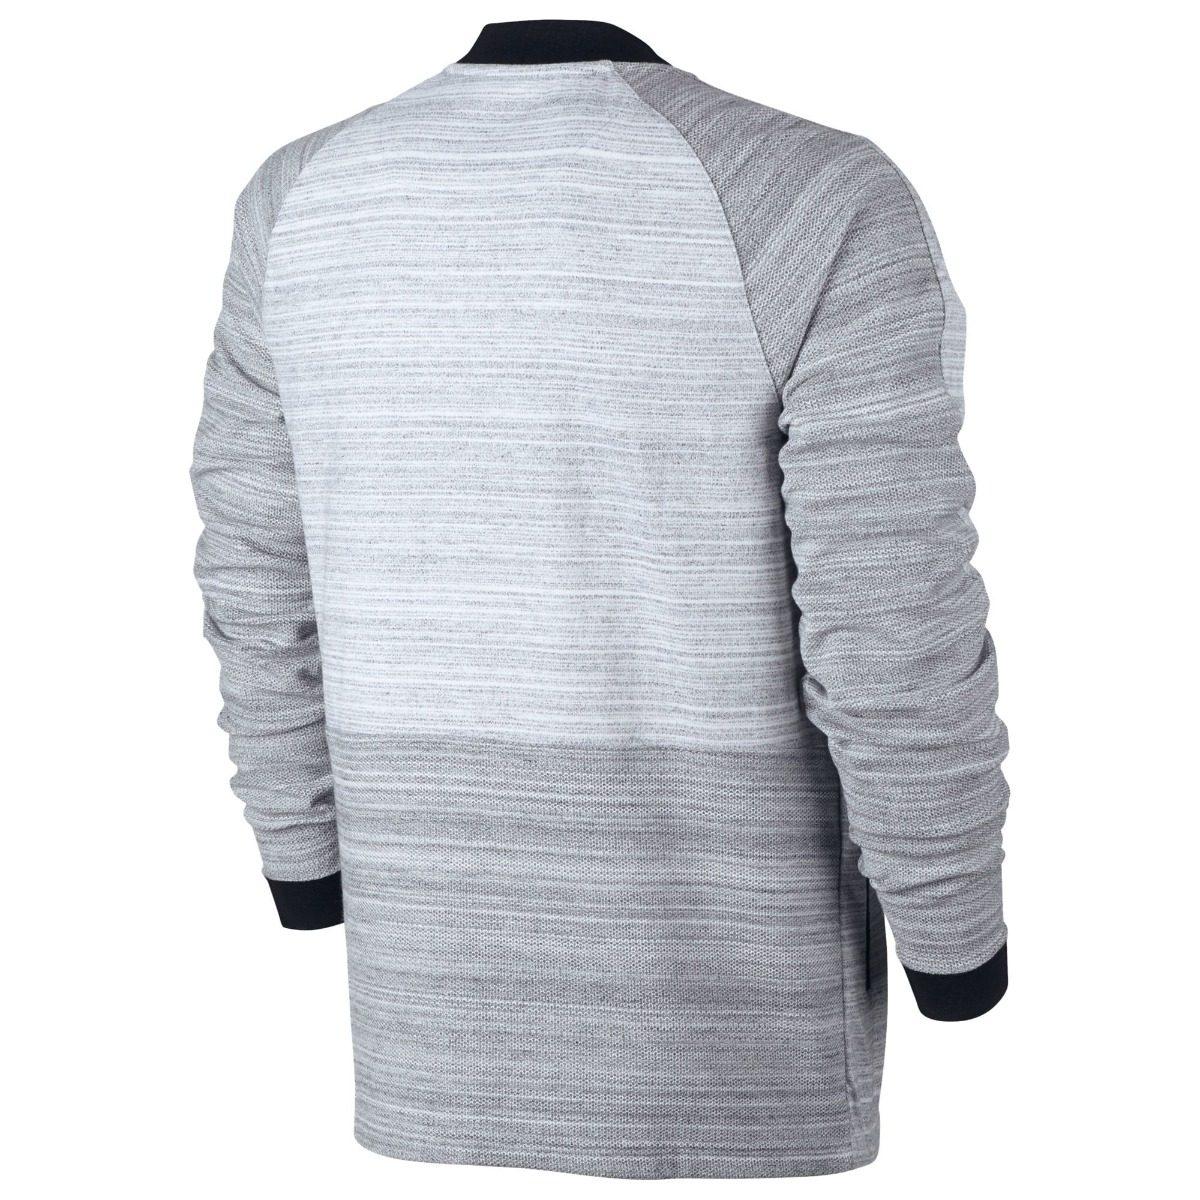 c857f7deb2 jaqueta nike sportswear advance 15 - original. Carregando zoom.